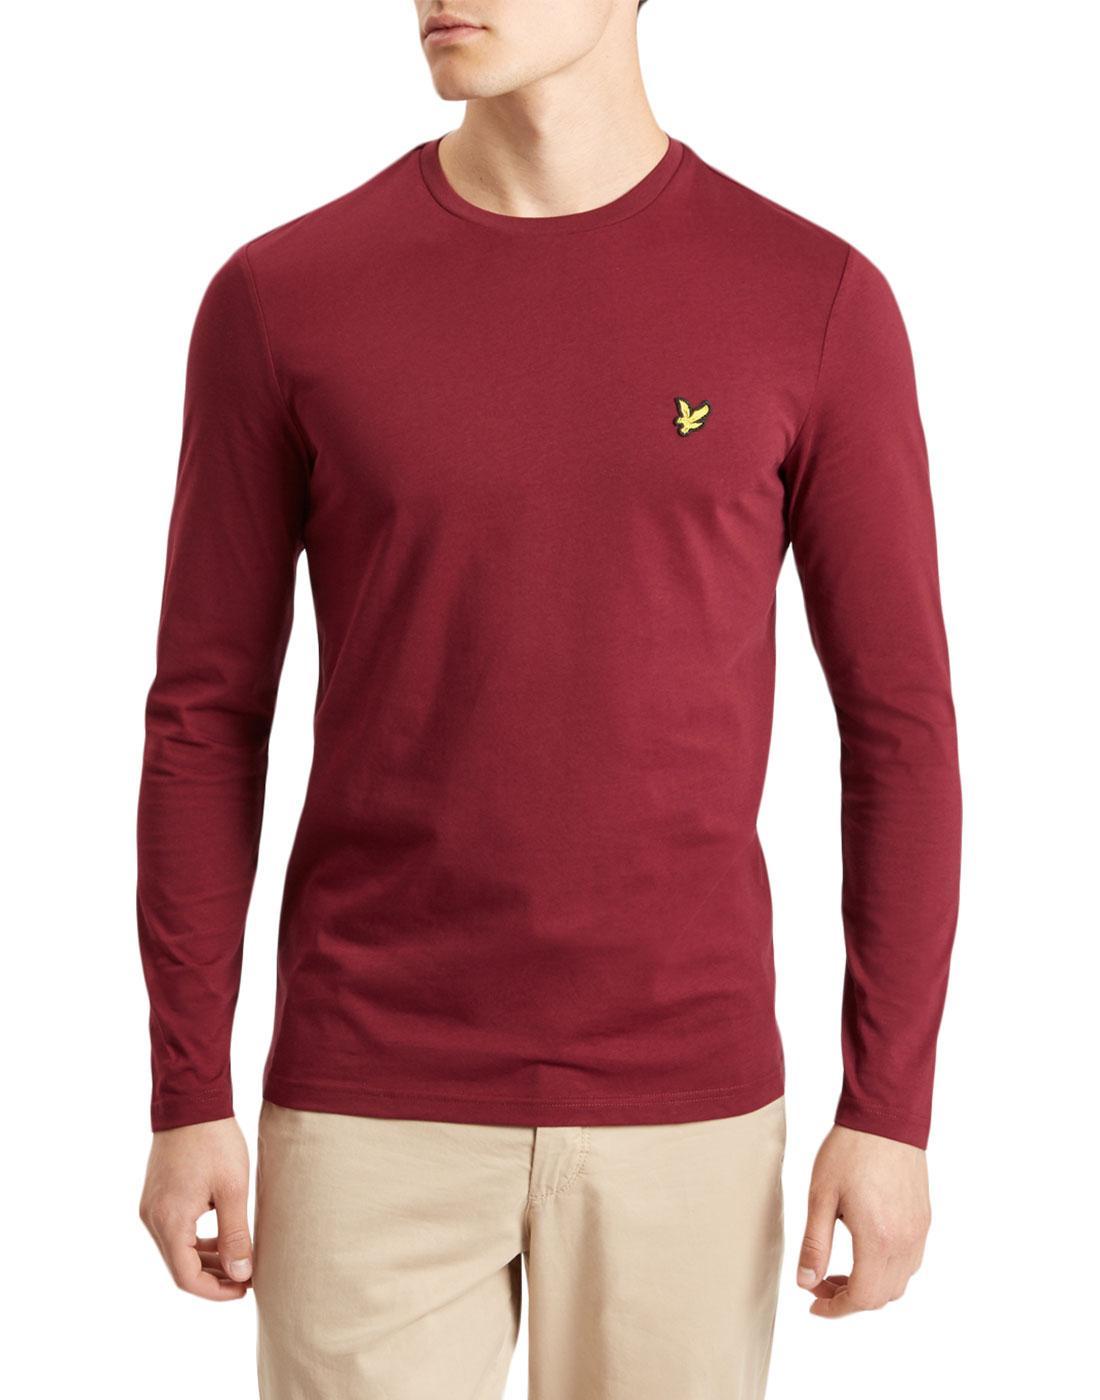 LYLE & SCOTT Men's Retro LS Crew Neck T-Shirt (CJ)